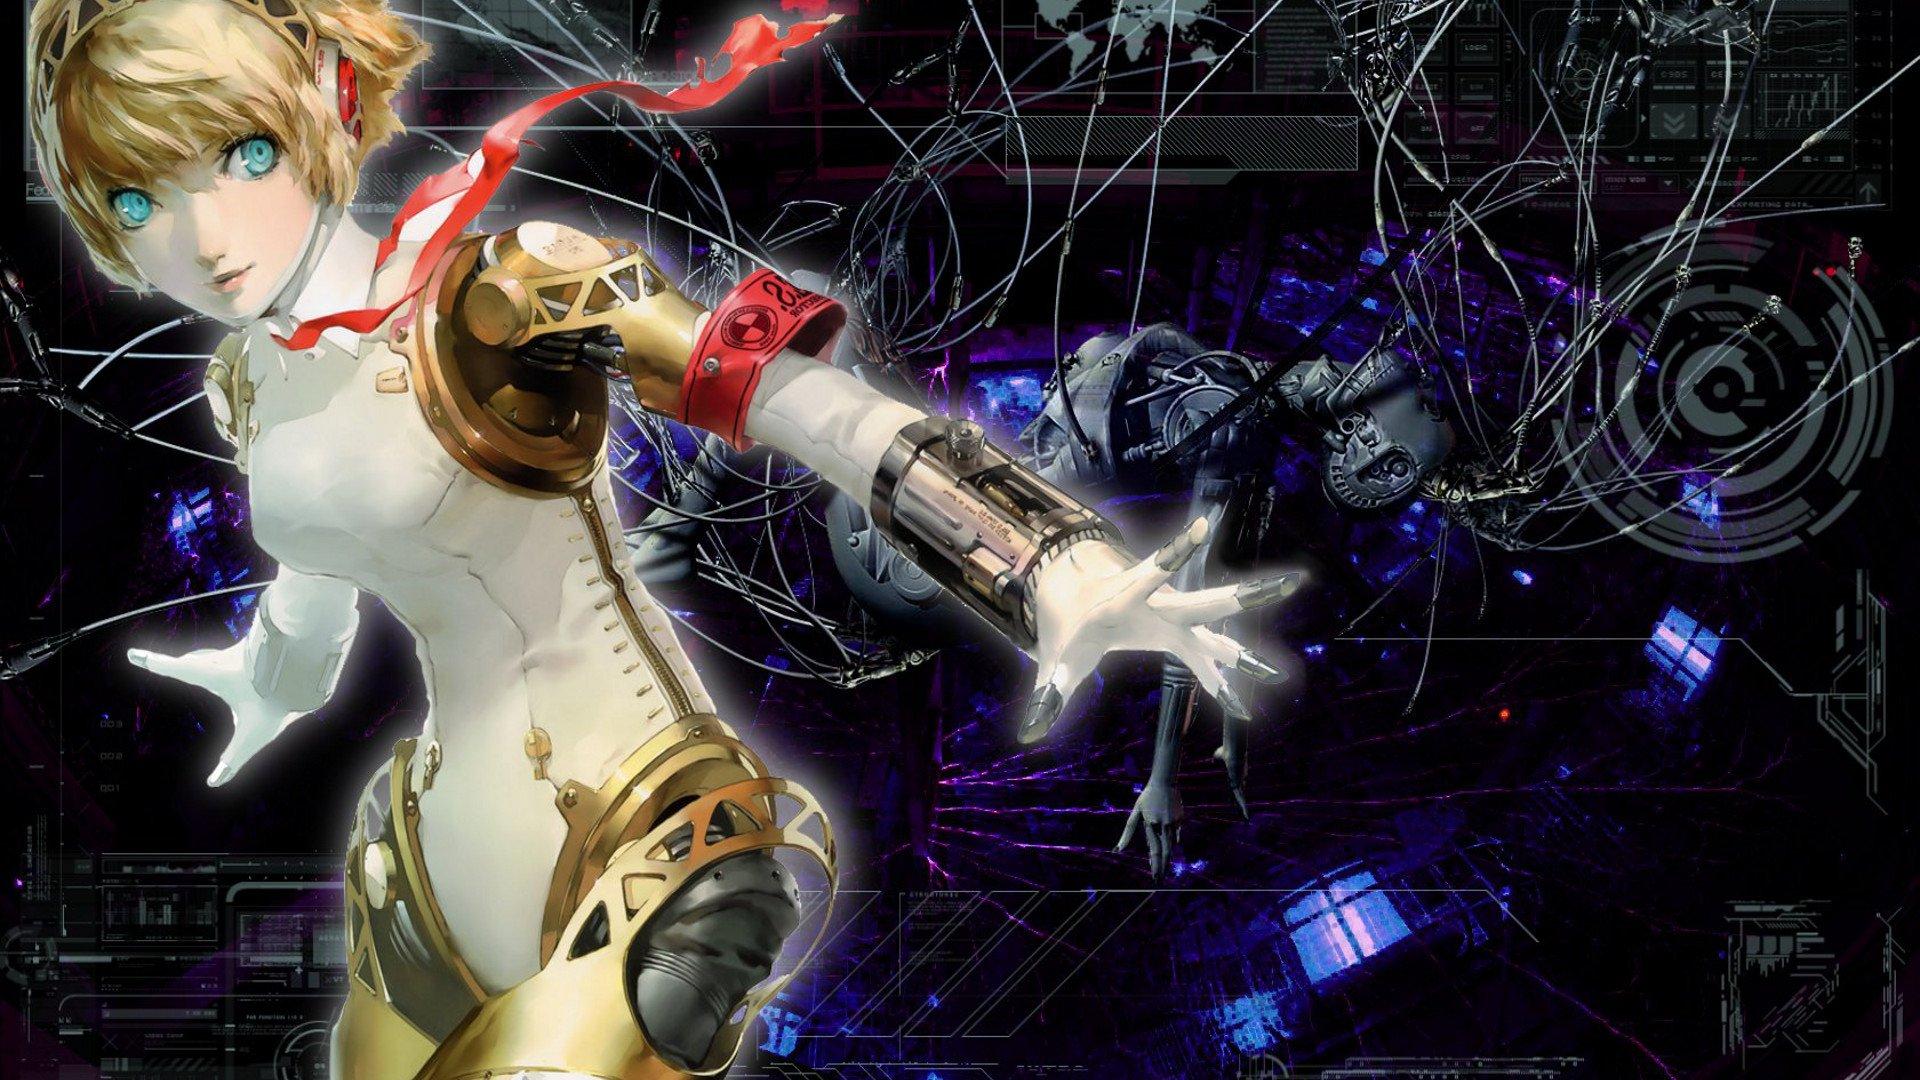 Persona 3 HD Wallpaper | Background Image | 1920x1080 | ID ...